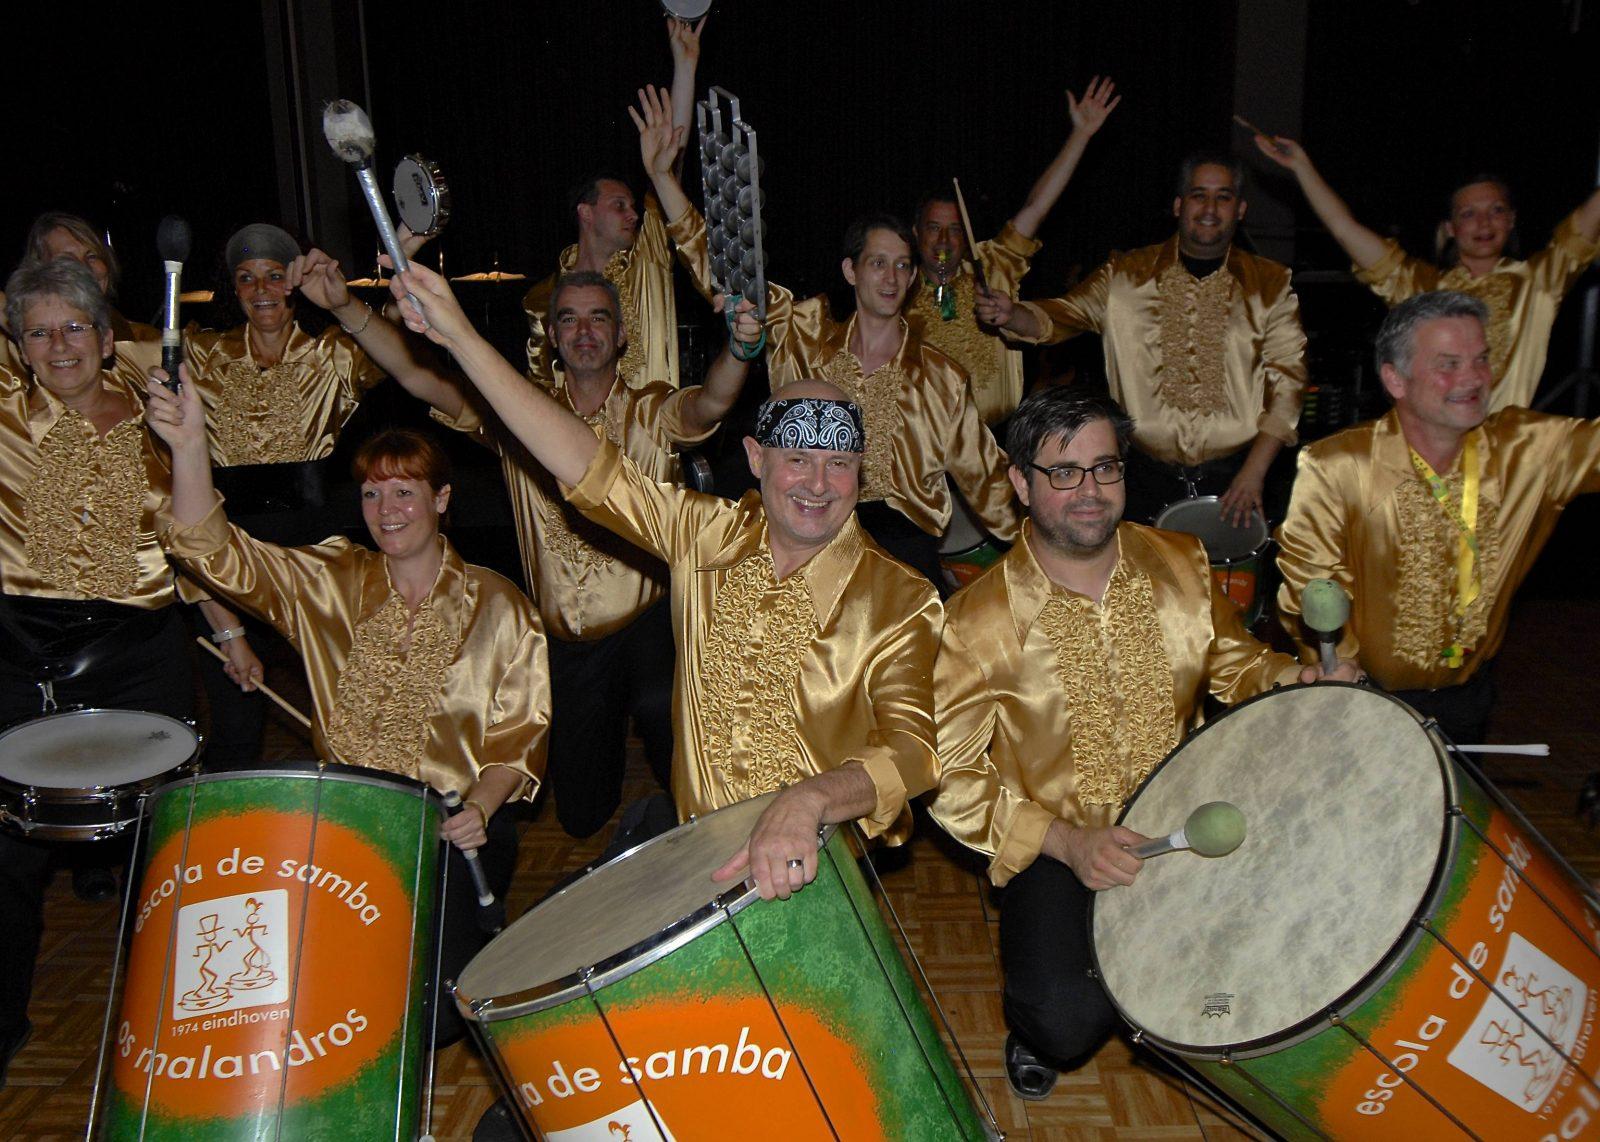 sambaband Os Malandros